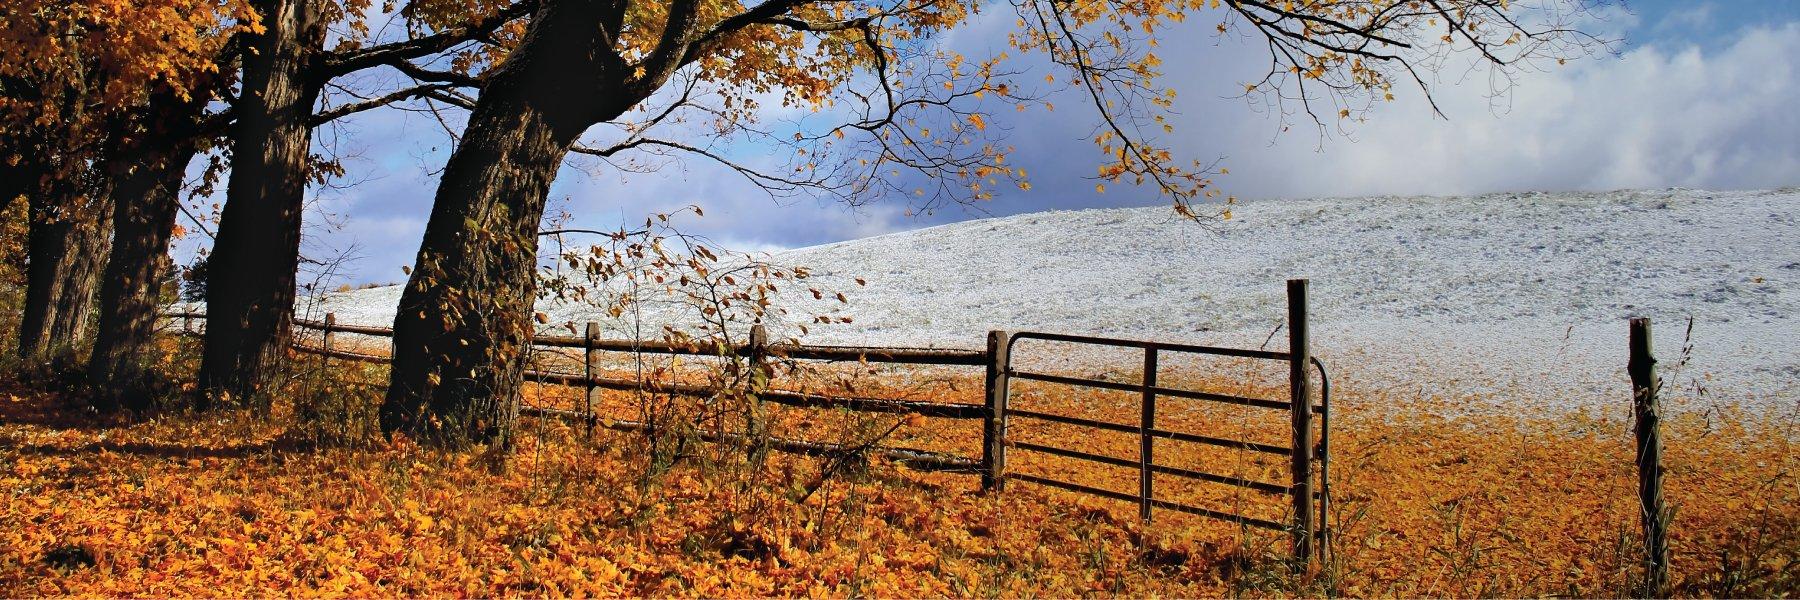 Fall Winter Scene